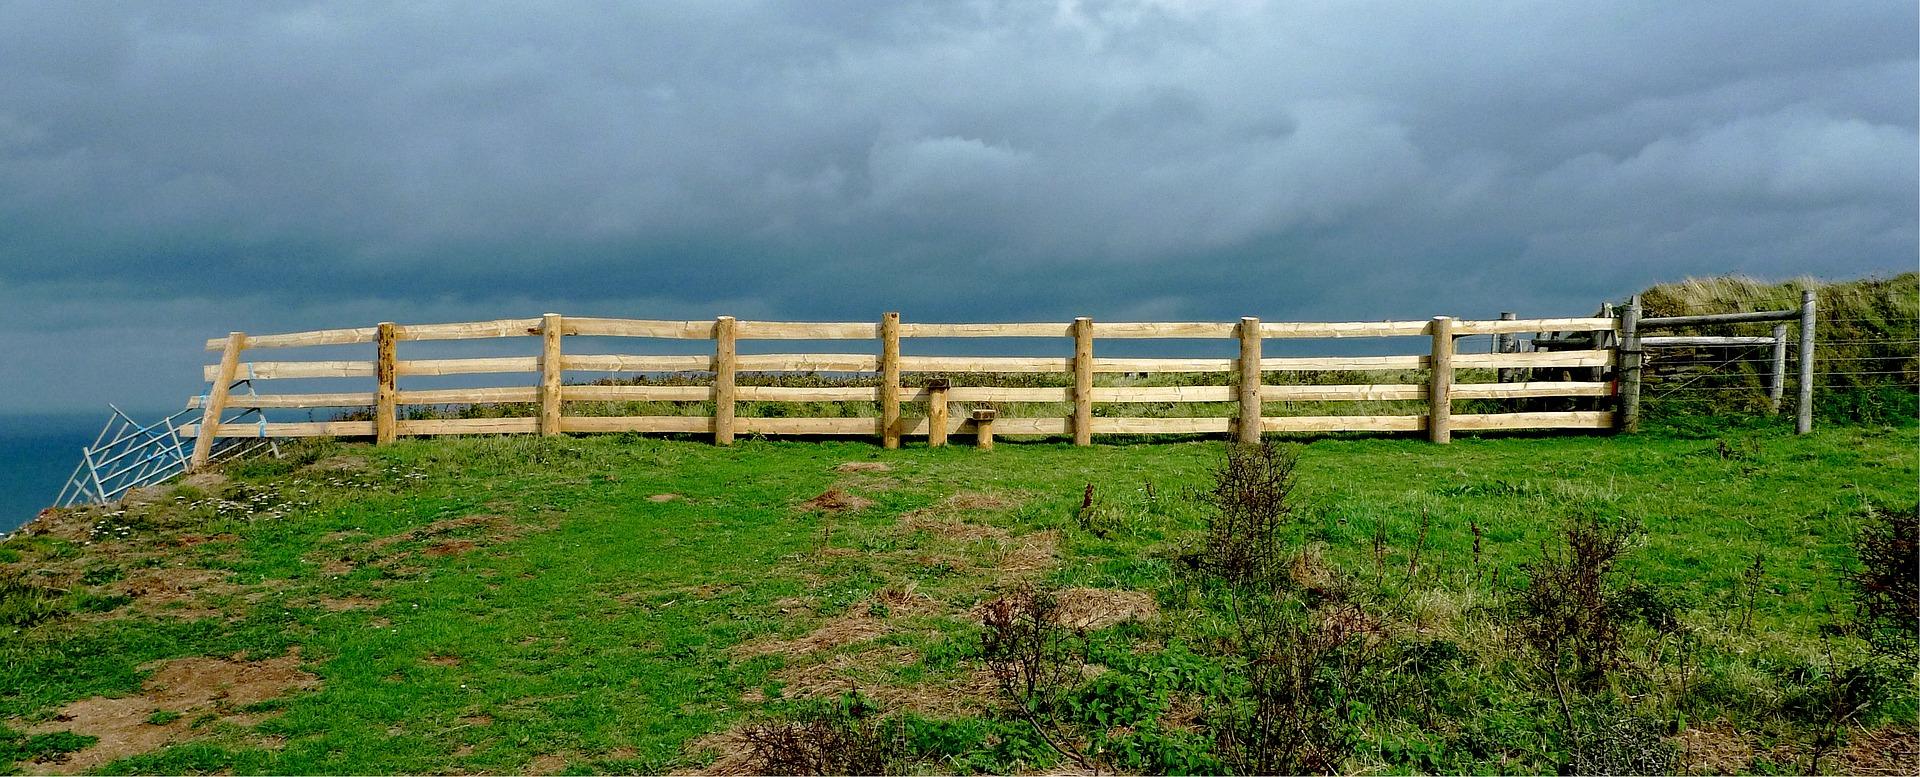 fence-1670087_1920